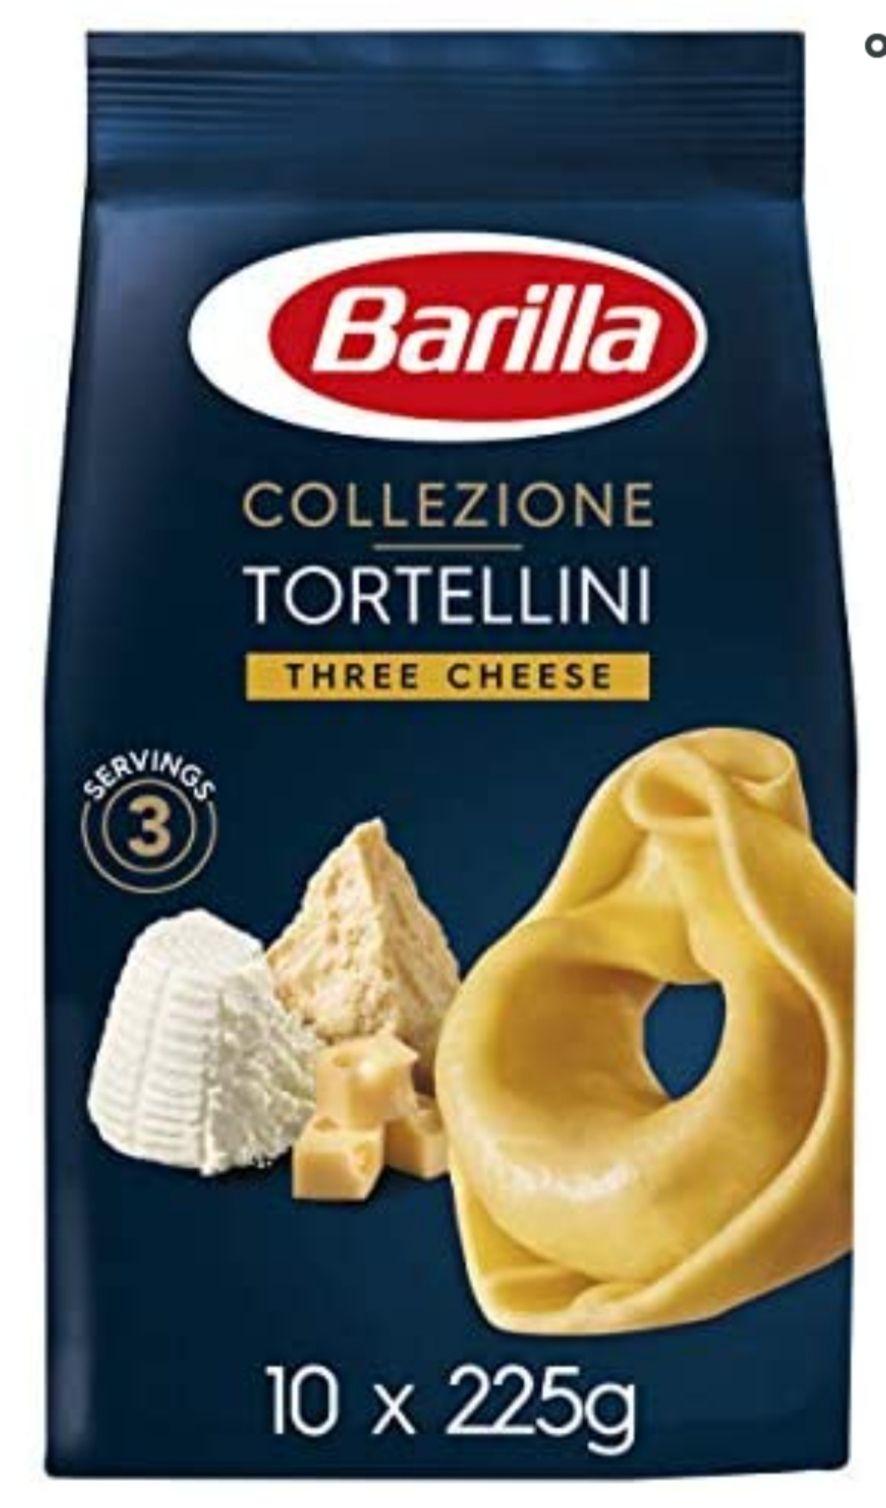 Barilla Pasta, Premium Tortellini Pasta, Three Cheese, Authentic Italian Quality, Pasta Bulk Pack of 10 x 225 g £4.83 + £4.49 NP @ Amazon